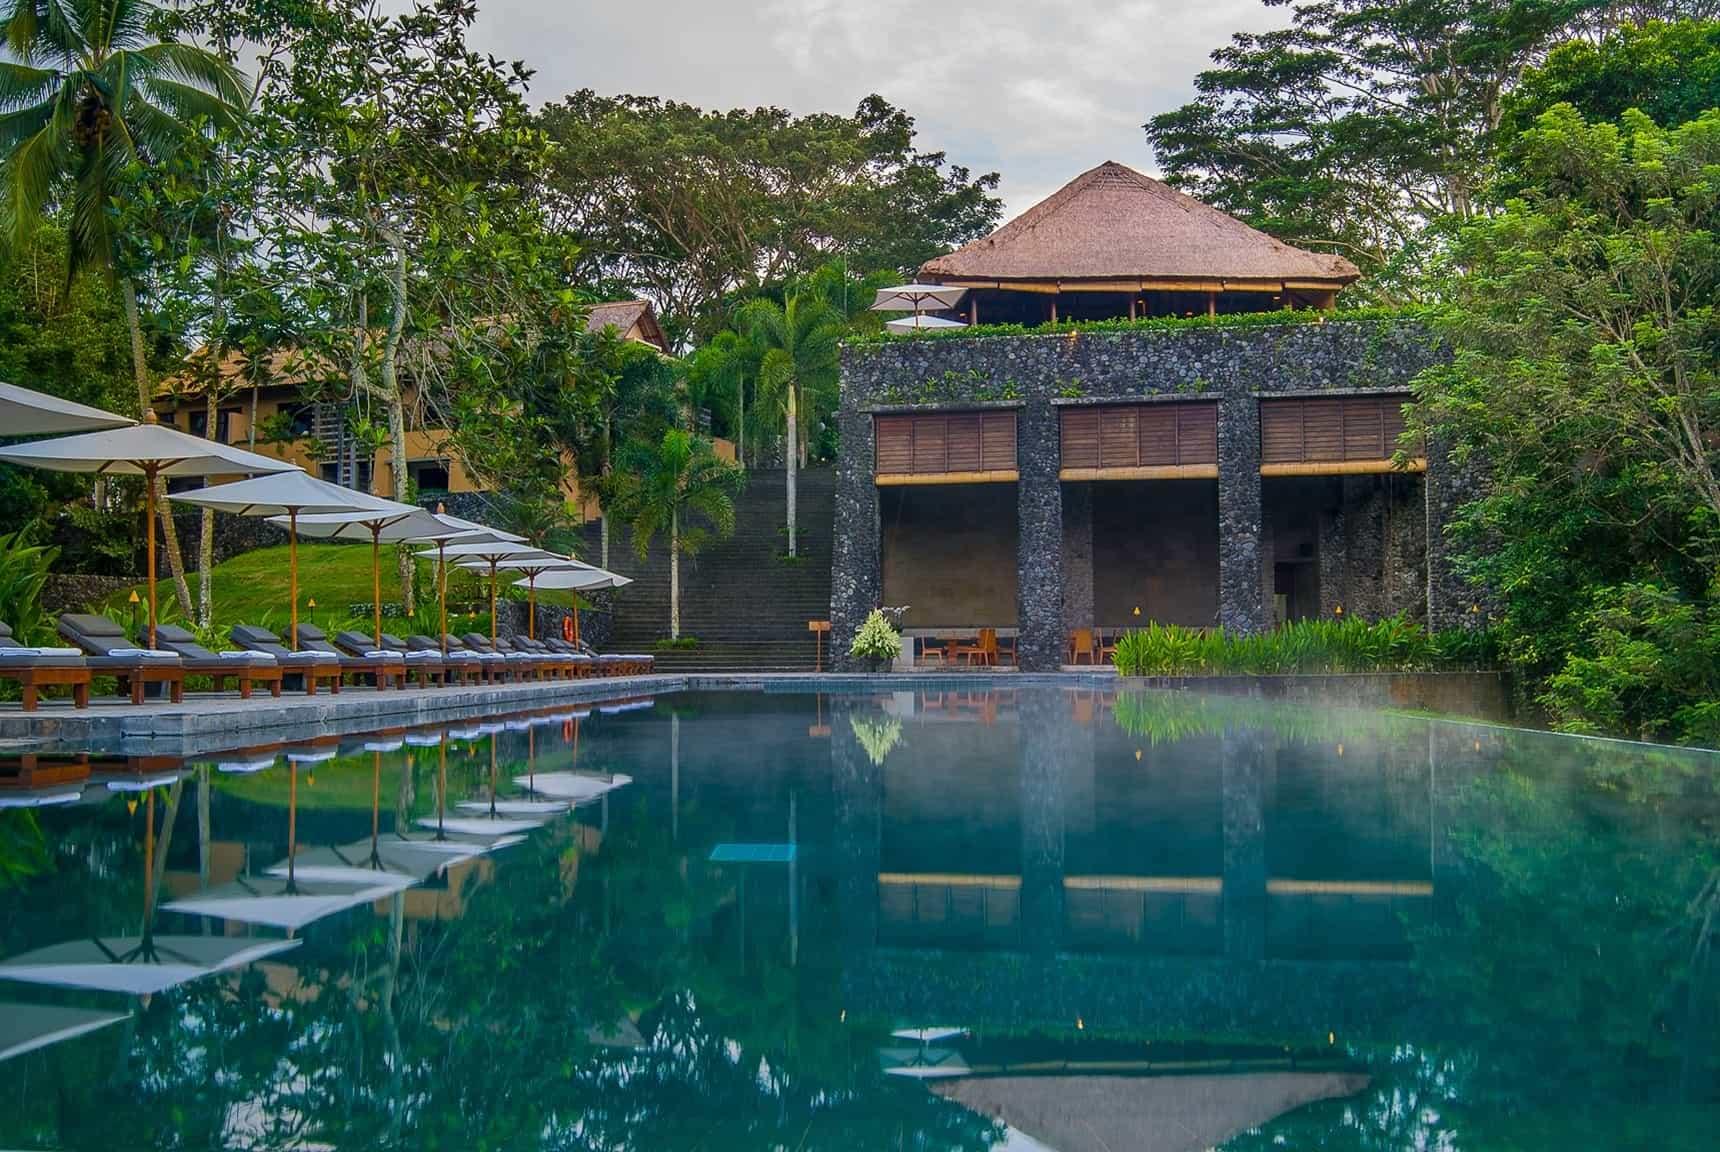 Bali hotel photography alila hotels and resorts ubud bali for Bali hotels and resorts